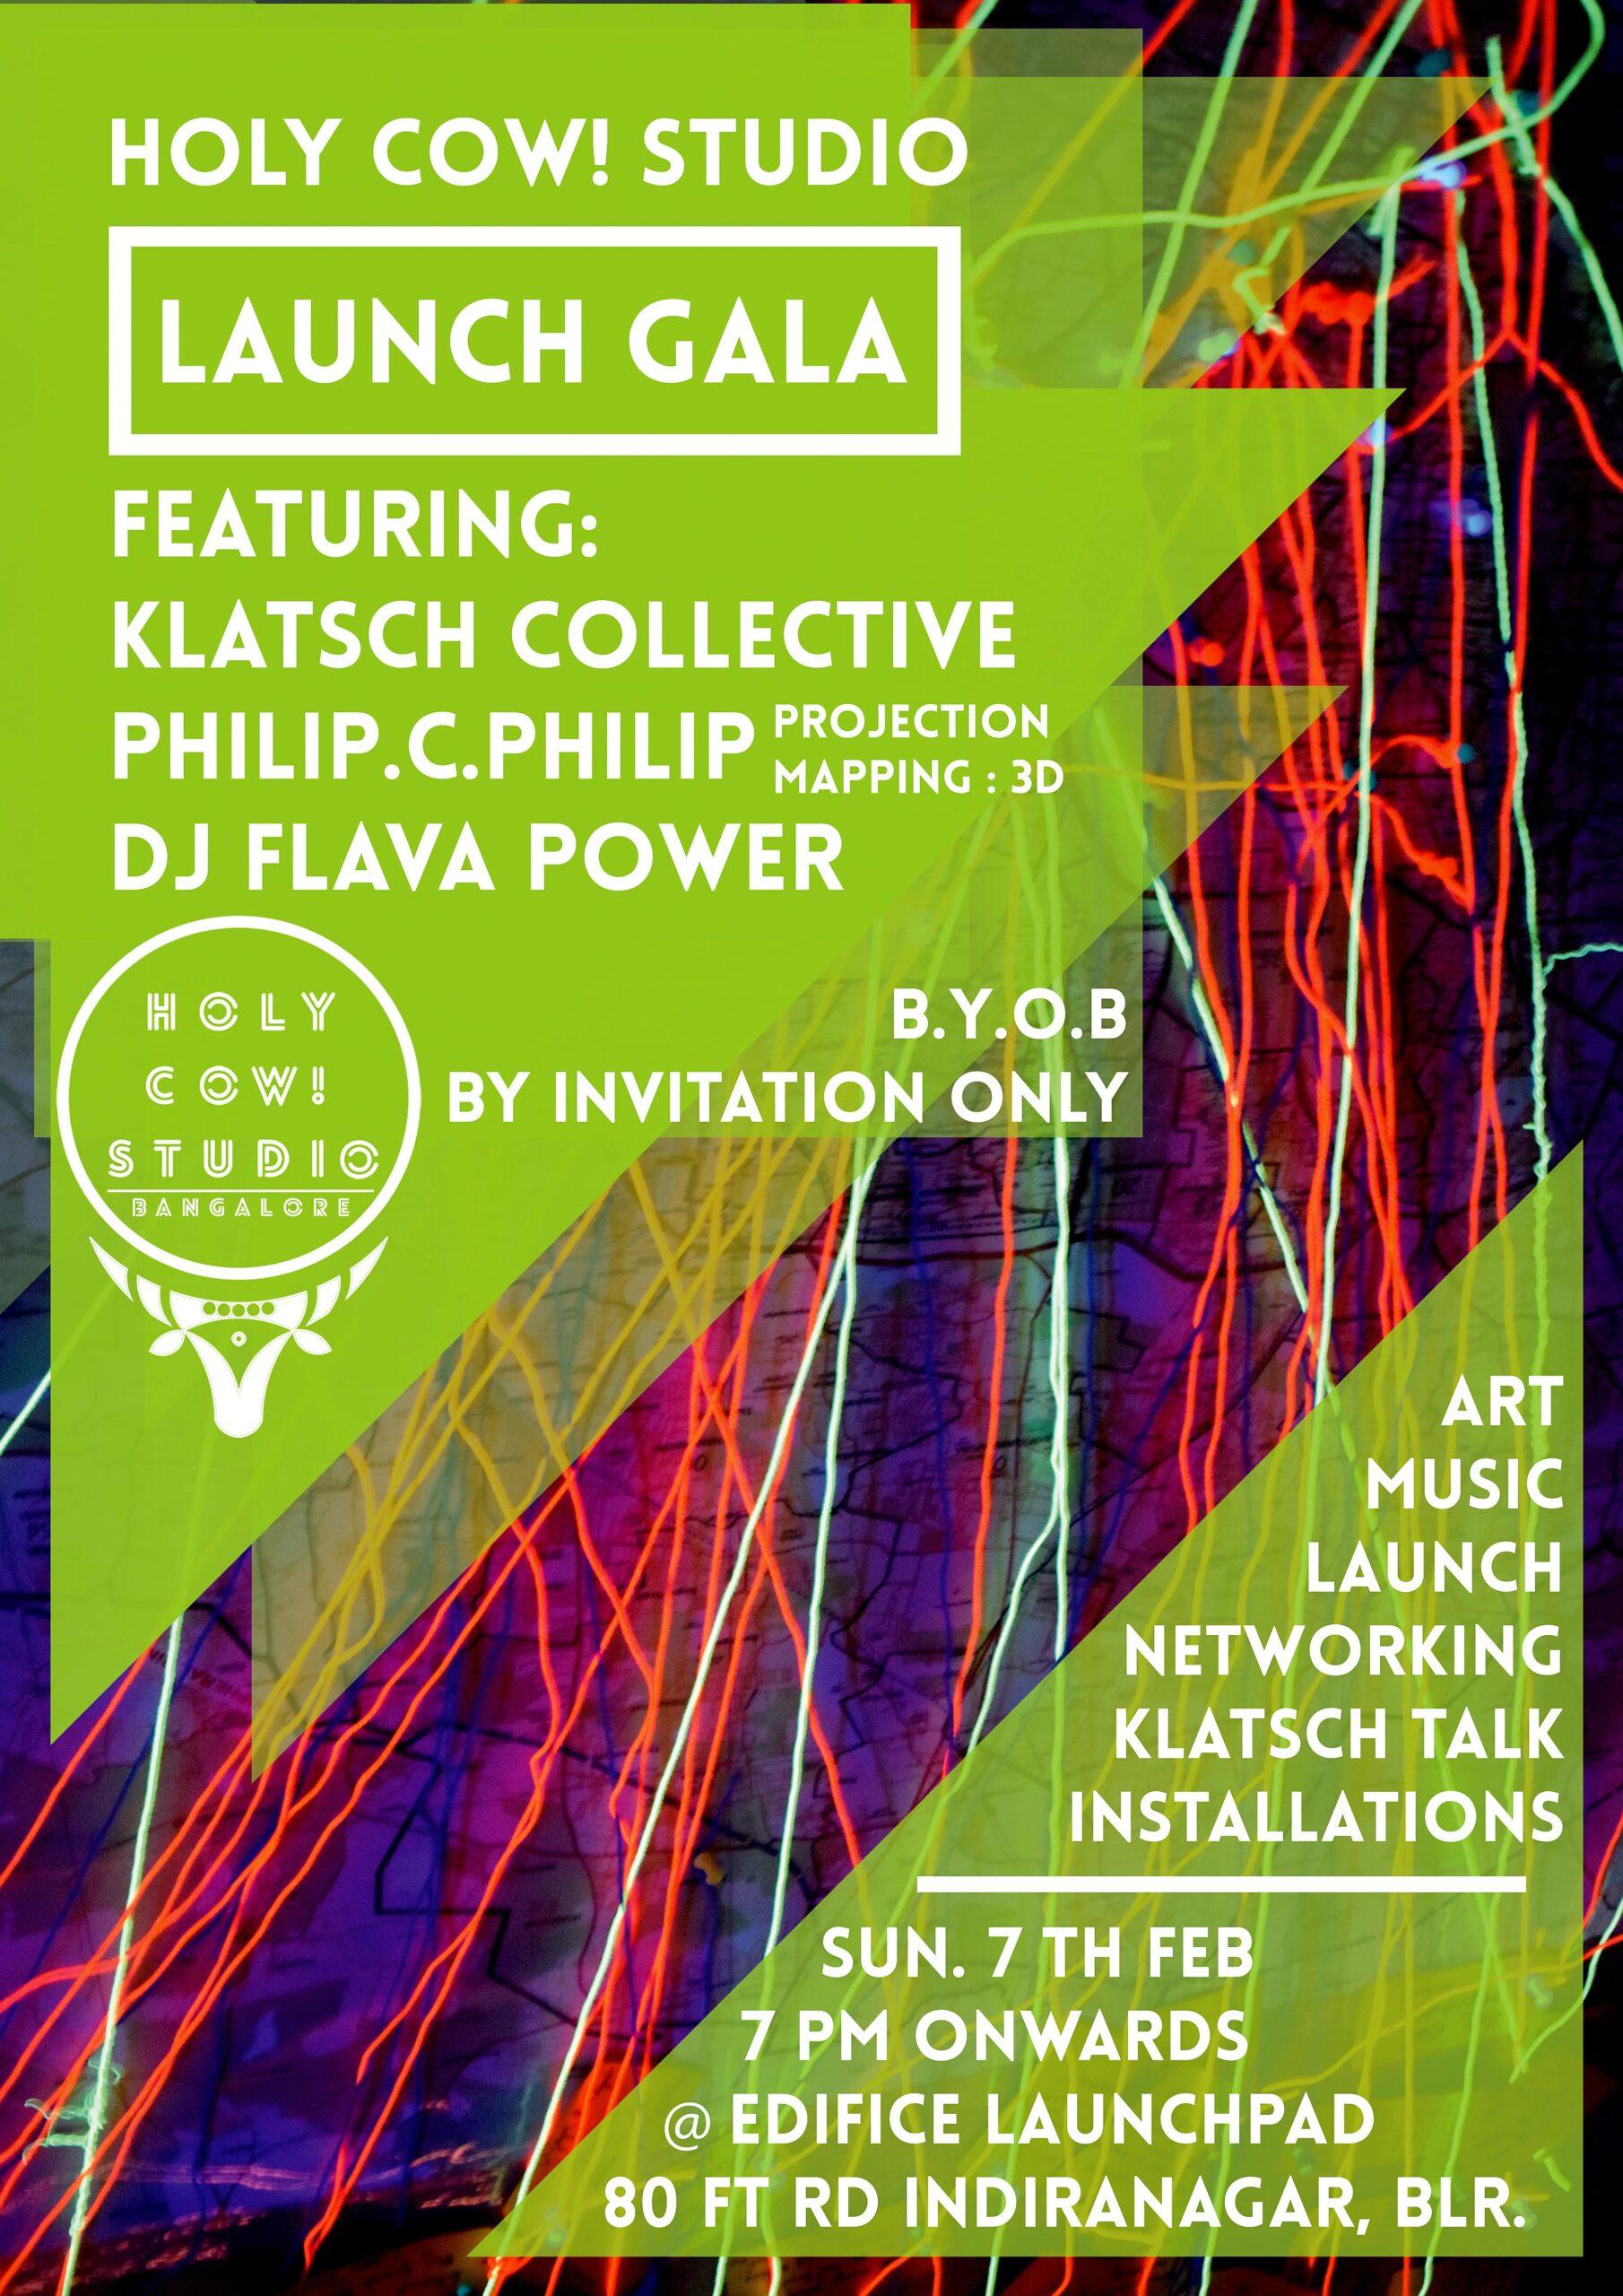 launch-gala-postersdgf-min